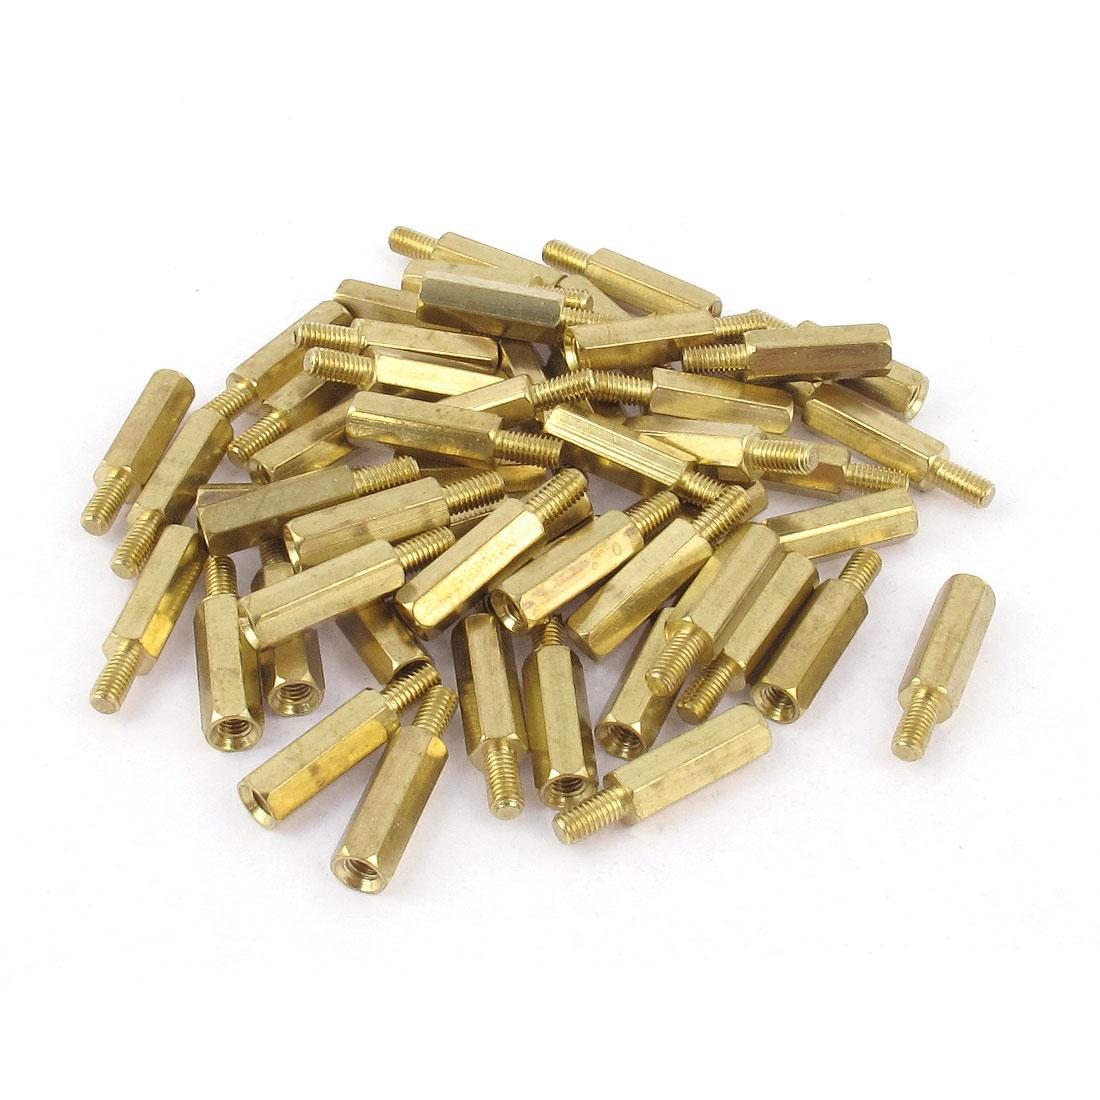 50Pcs M3 Male Female Thread Brass Hex Stand-Off PCB Spacer Screw Pillar